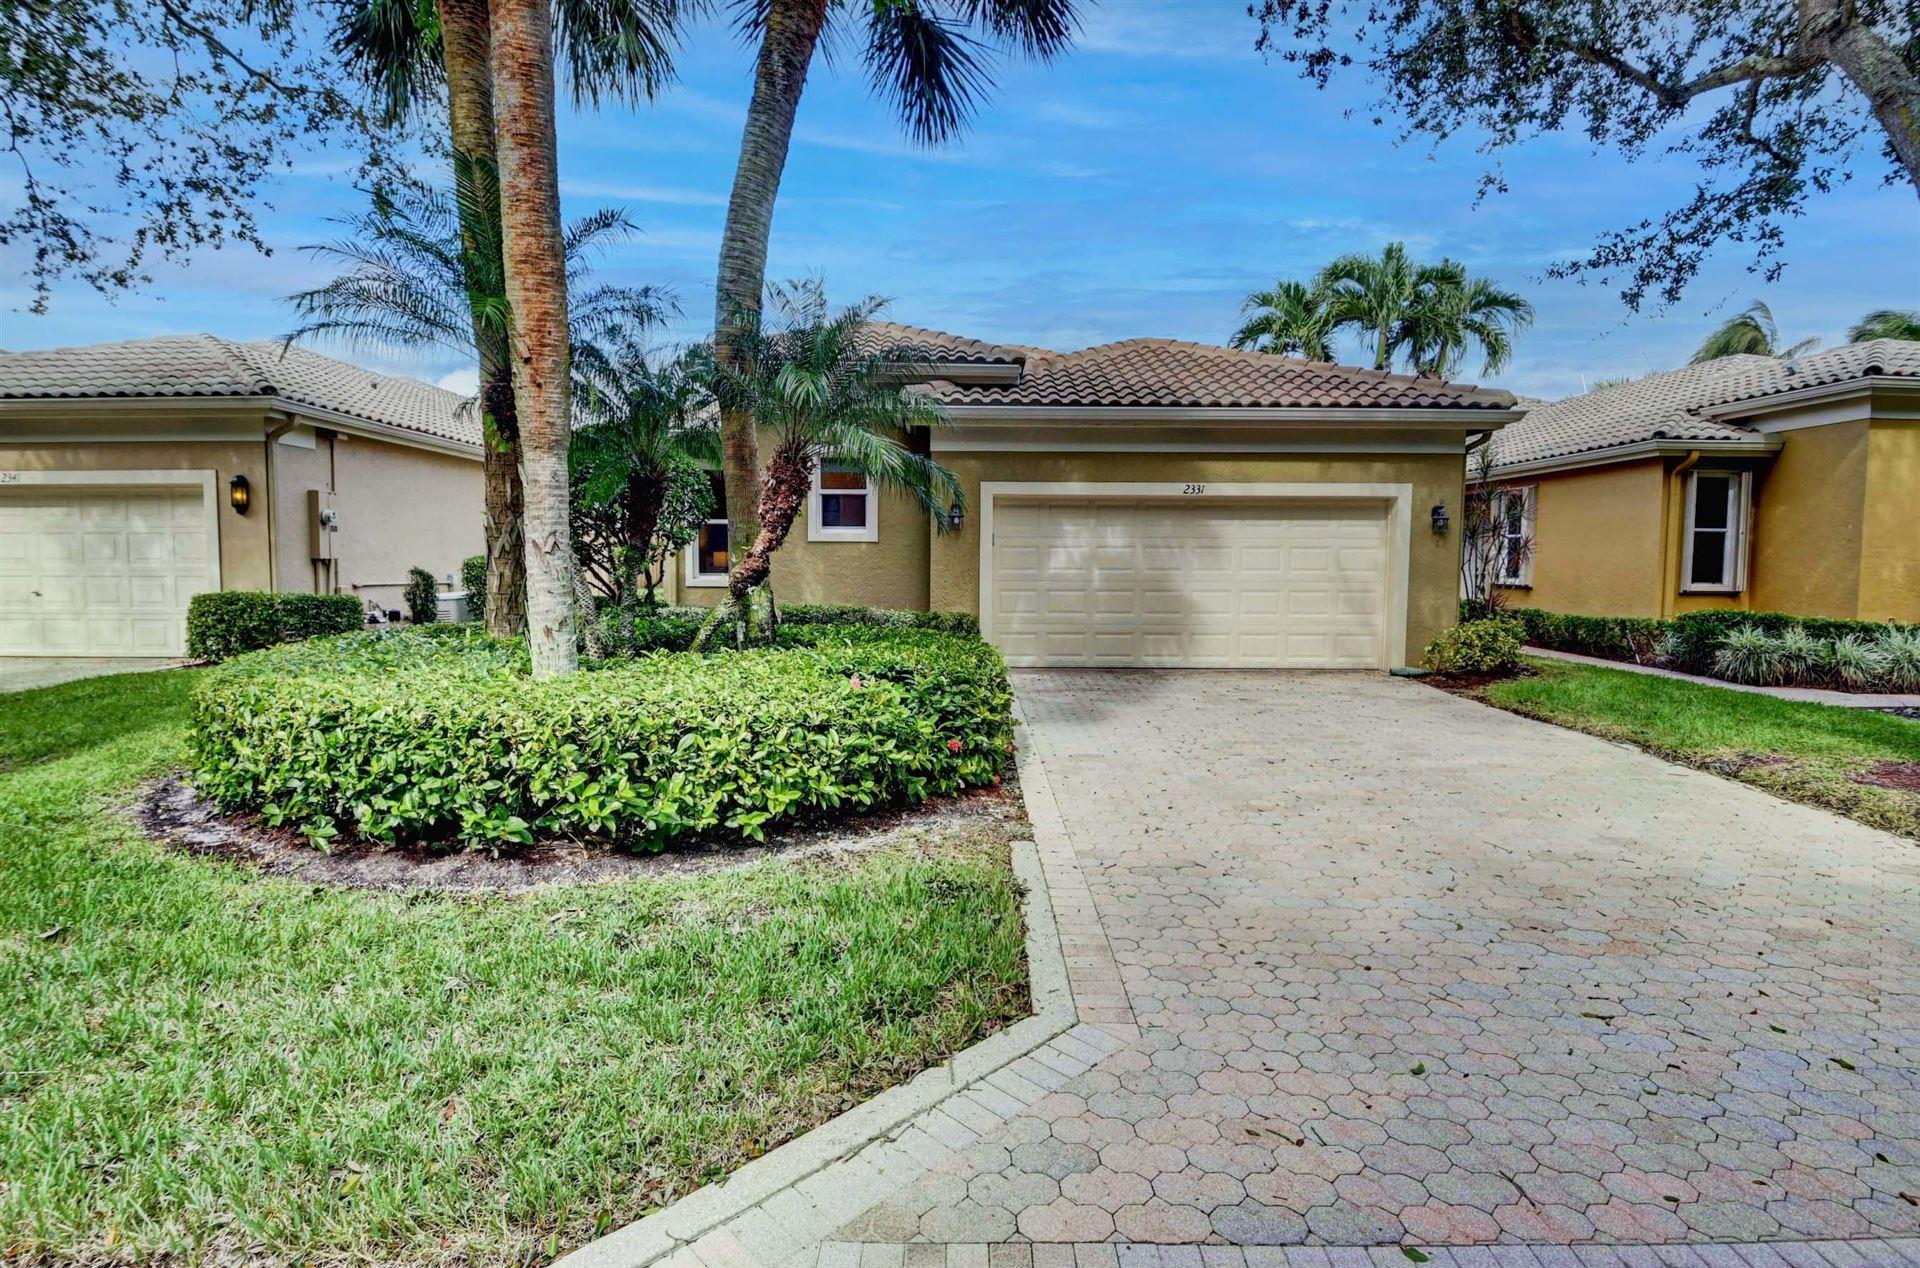 Photo of 2331 NW 66th Drive, Boca Raton, FL 33496 (MLS # RX-10674649)